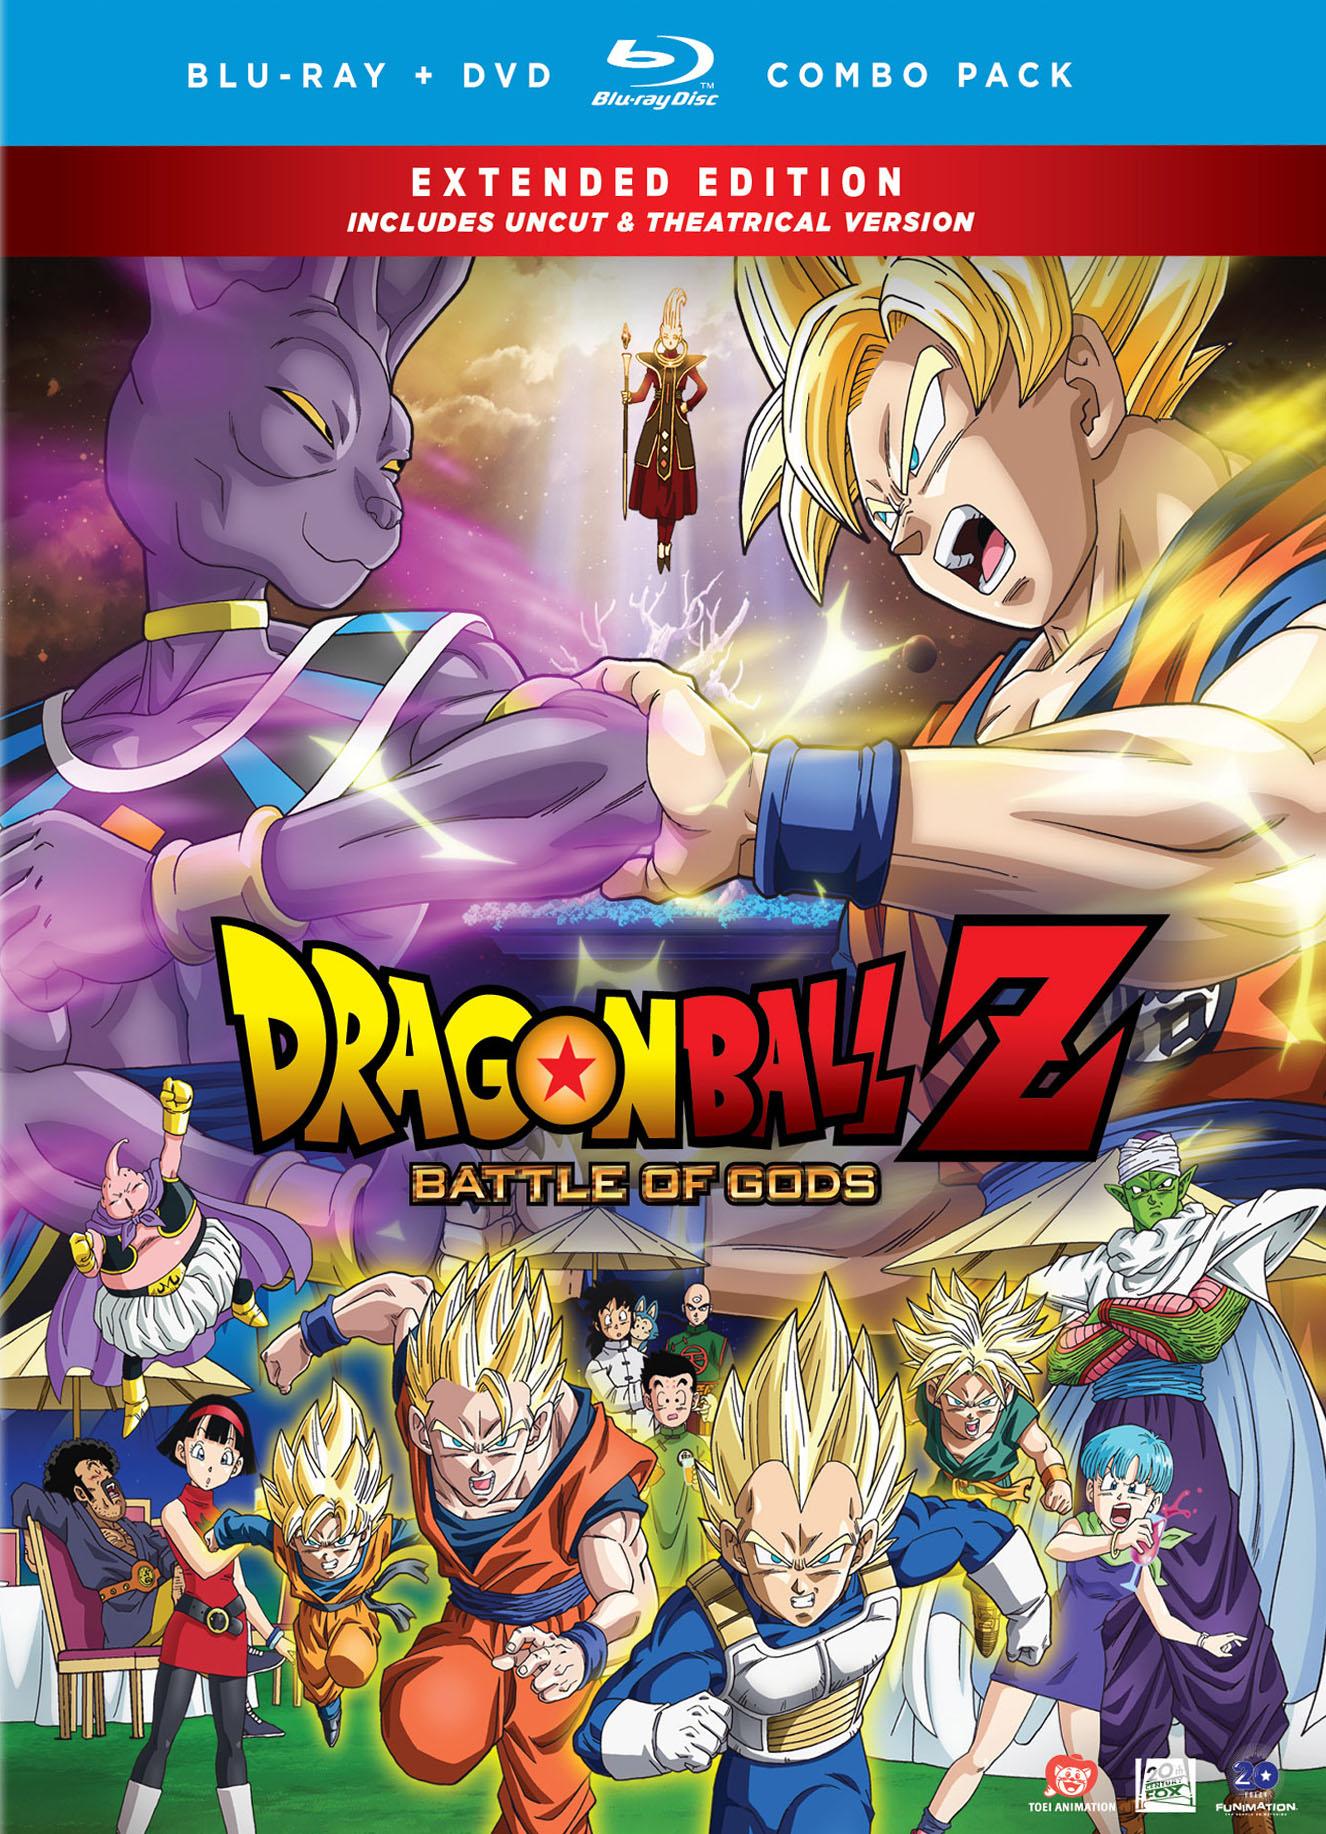 Dragon Ball Z : Battle Of Gods : dragon, battle, DragonBall, Battle, [Uncut/Theatrical], Discs], [Blu-ray/DVD]